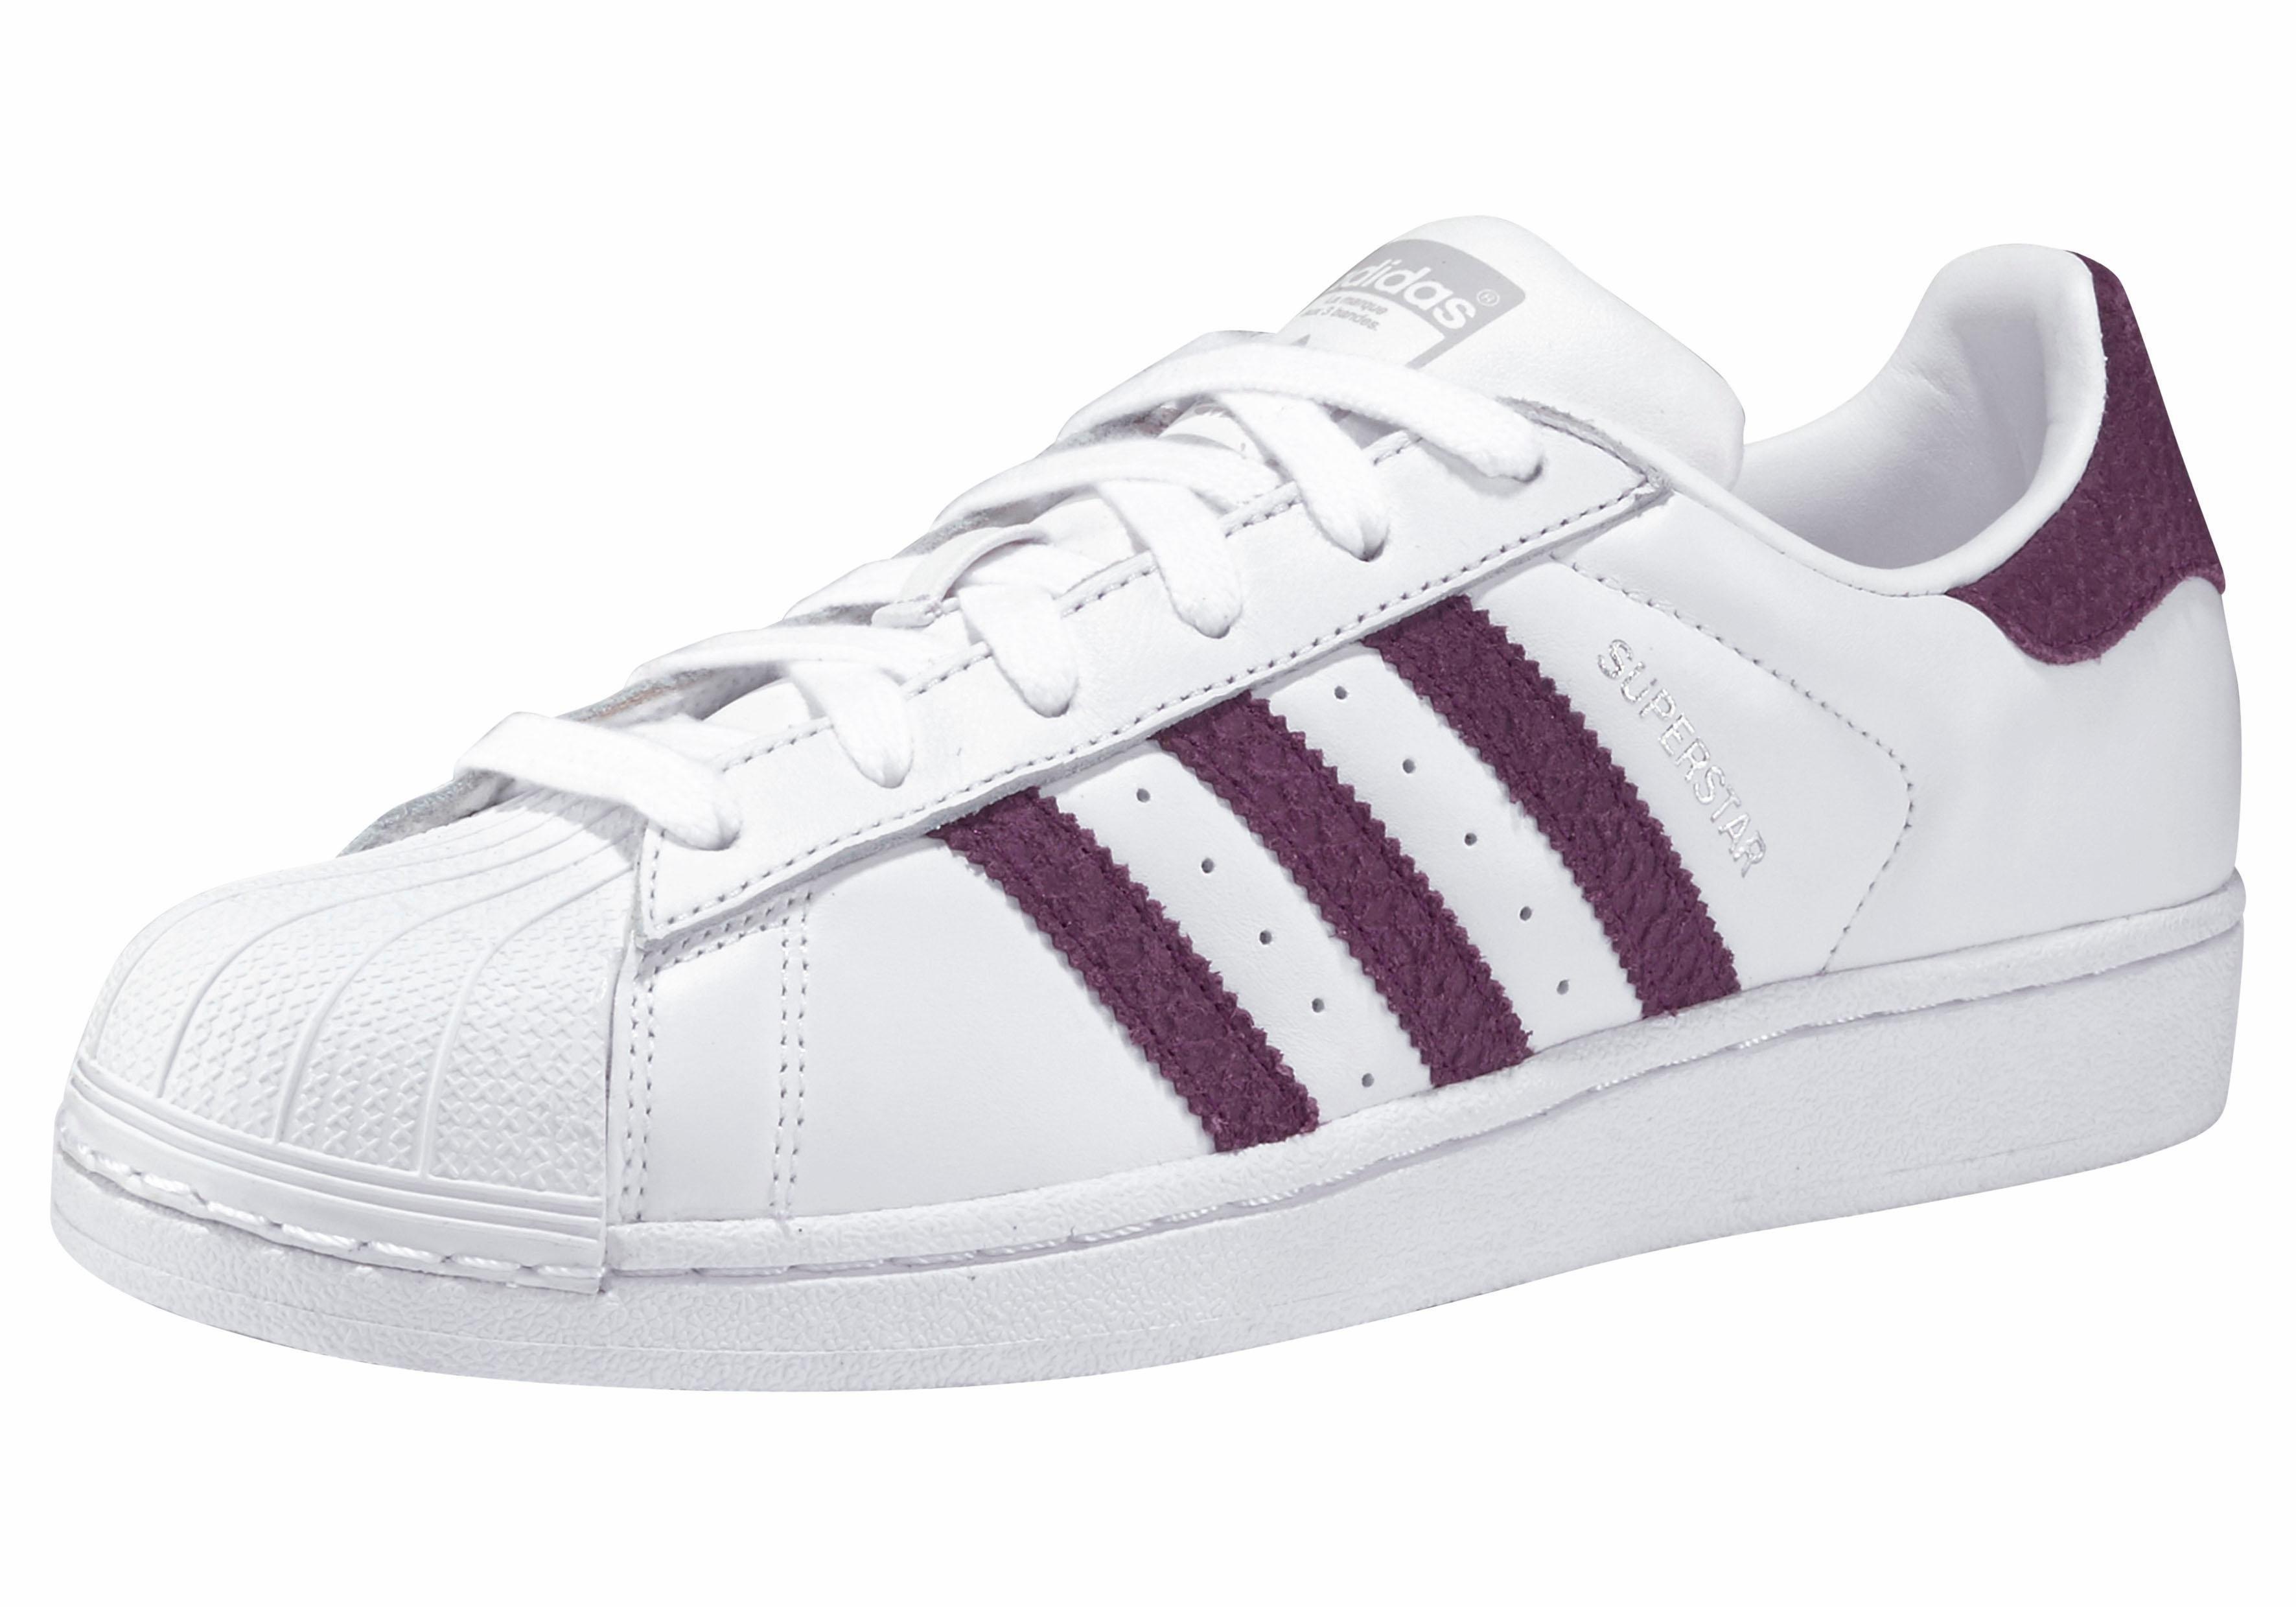 e7f27b85dd7 adidas Superstar online kopen? Bekijk de collectie hier | OTTO